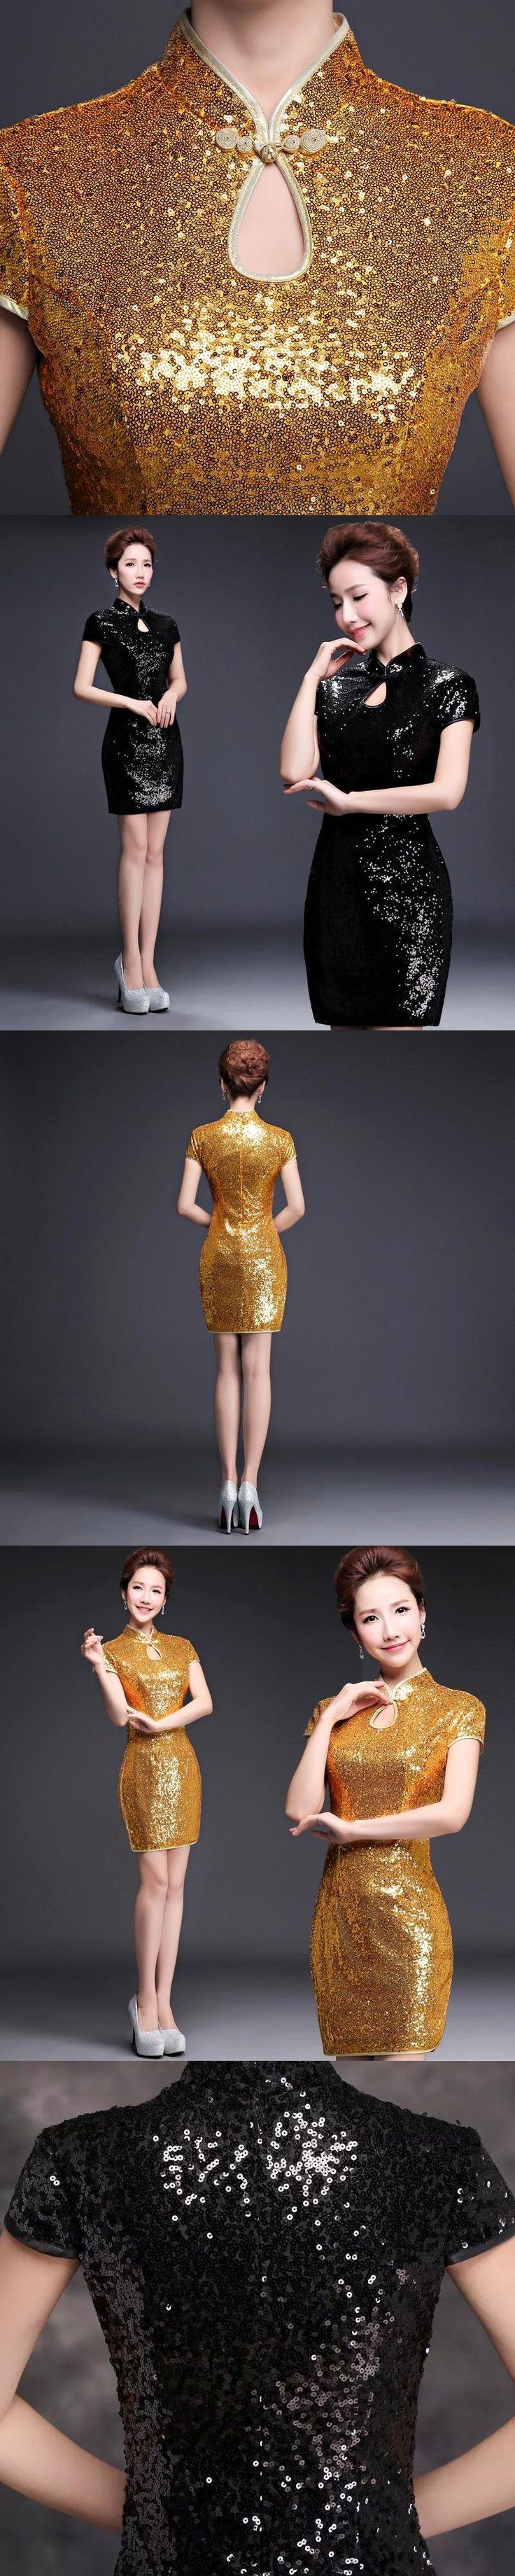 lady short golden sequin formal dinner party chinese cheongsam dresses summer size customized plus size xxxl elegant